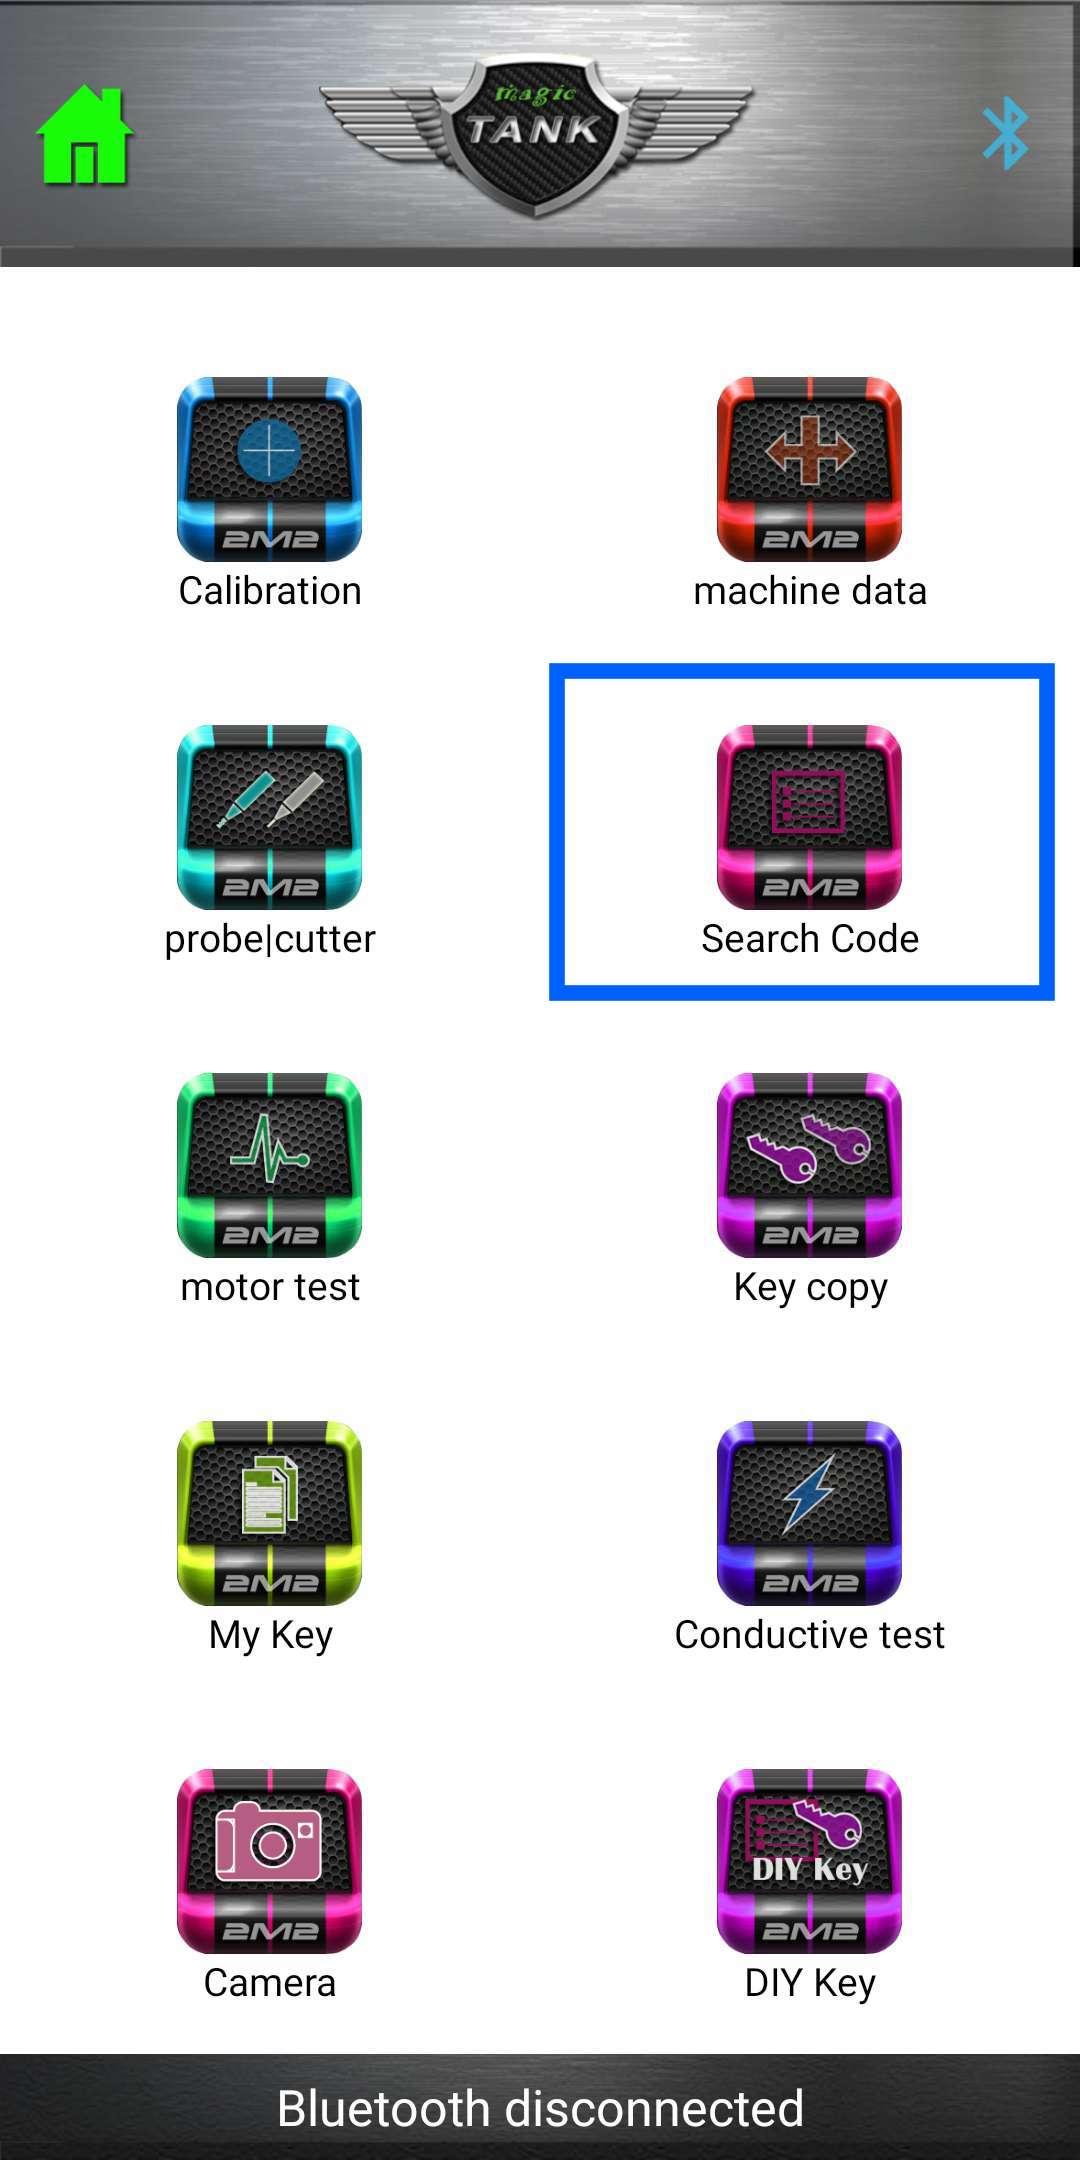 2m2-search-code